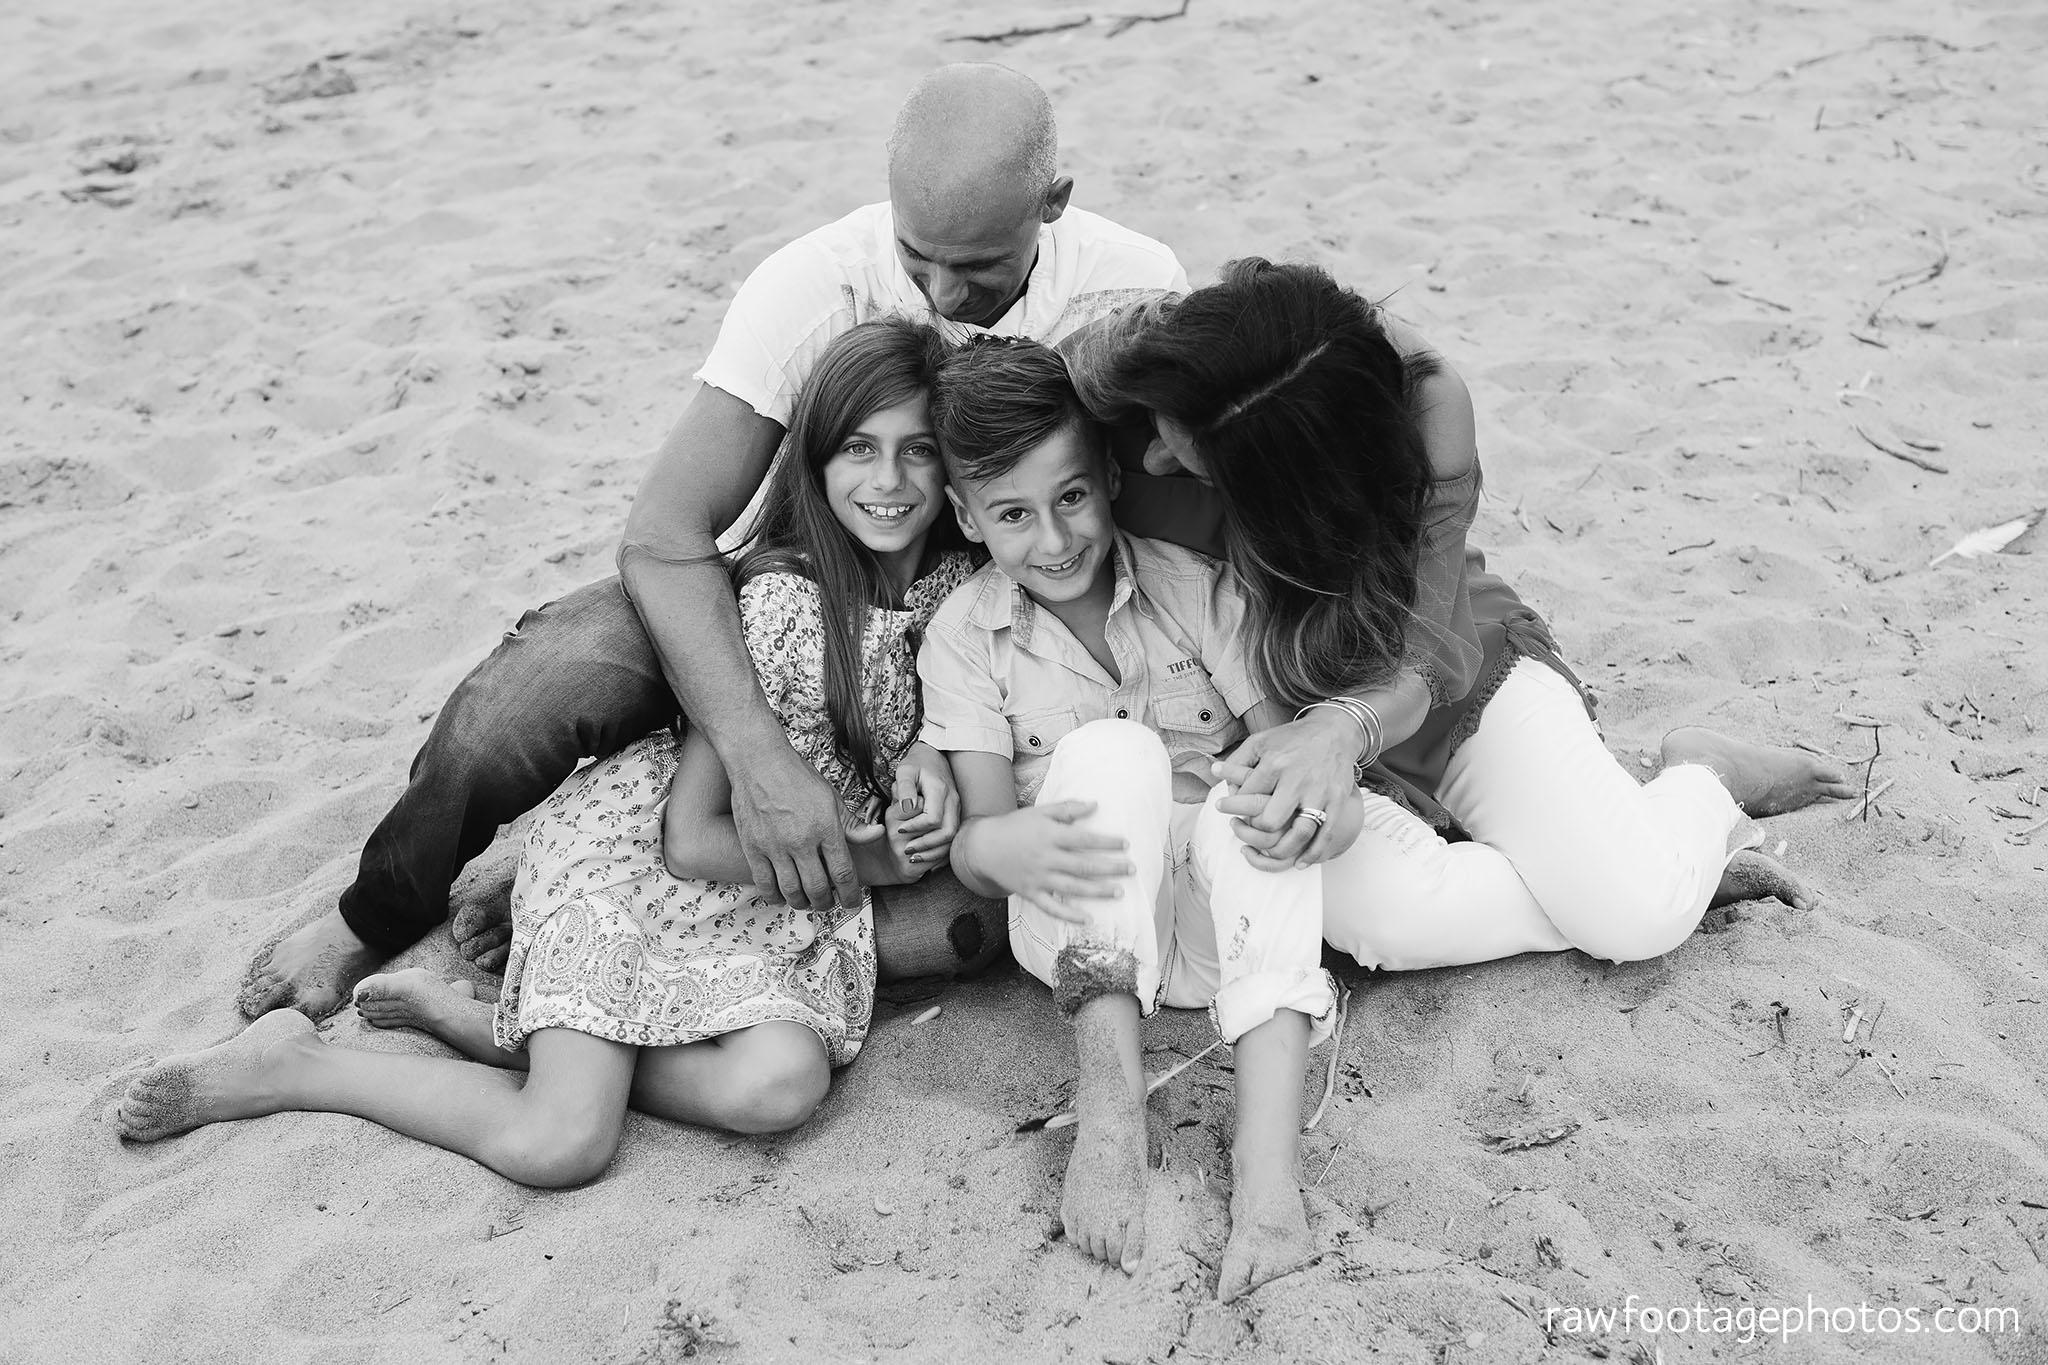 London_ontario_family_photographer_beach_photos046_1.jpg